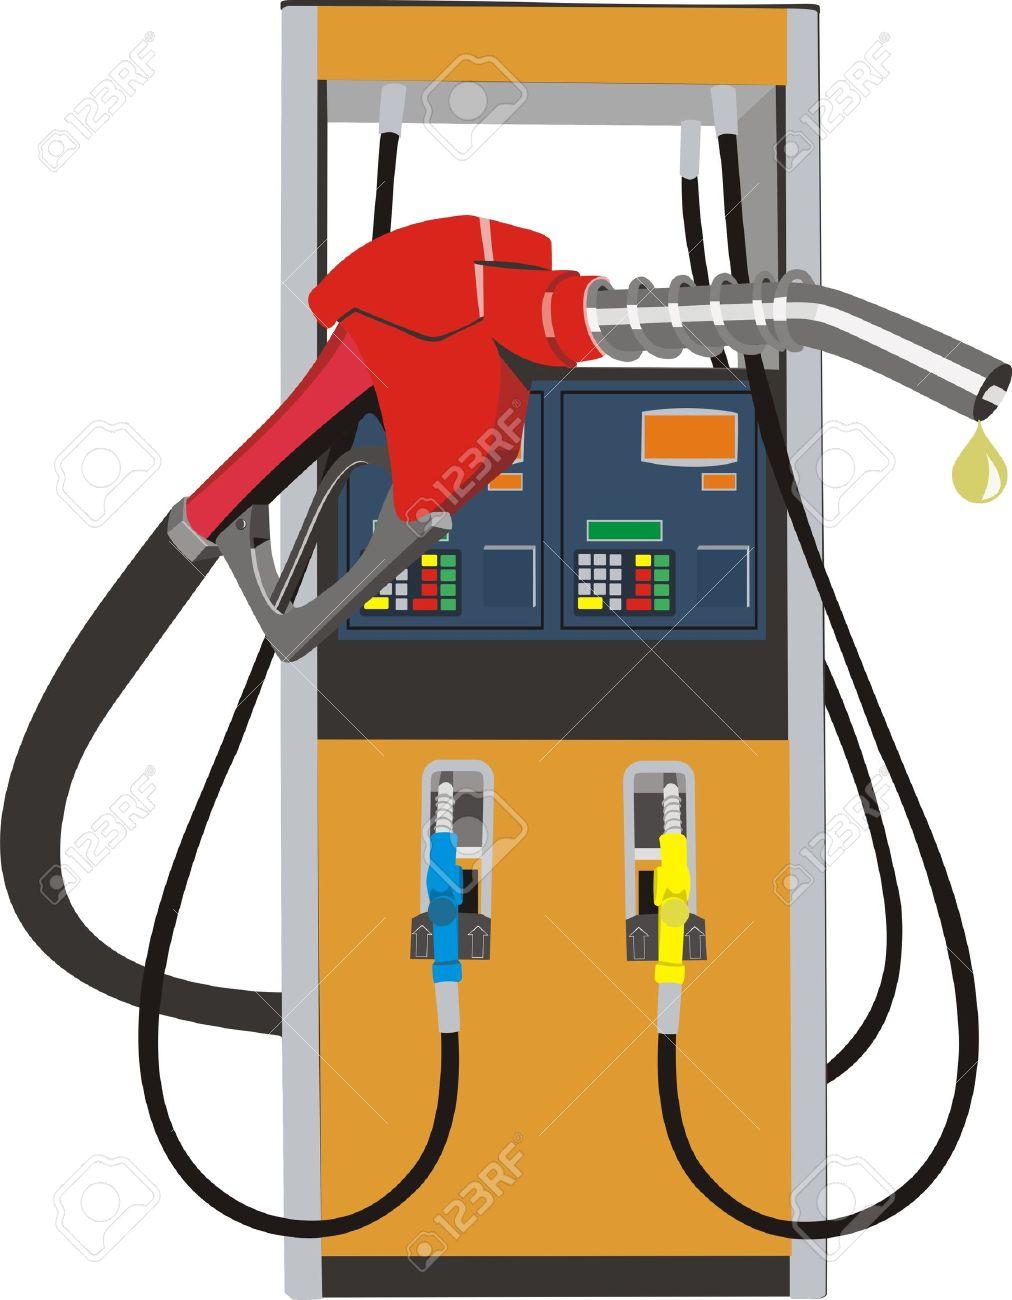 Cool cliparts stock vector. Gas clipart petrol pump machine